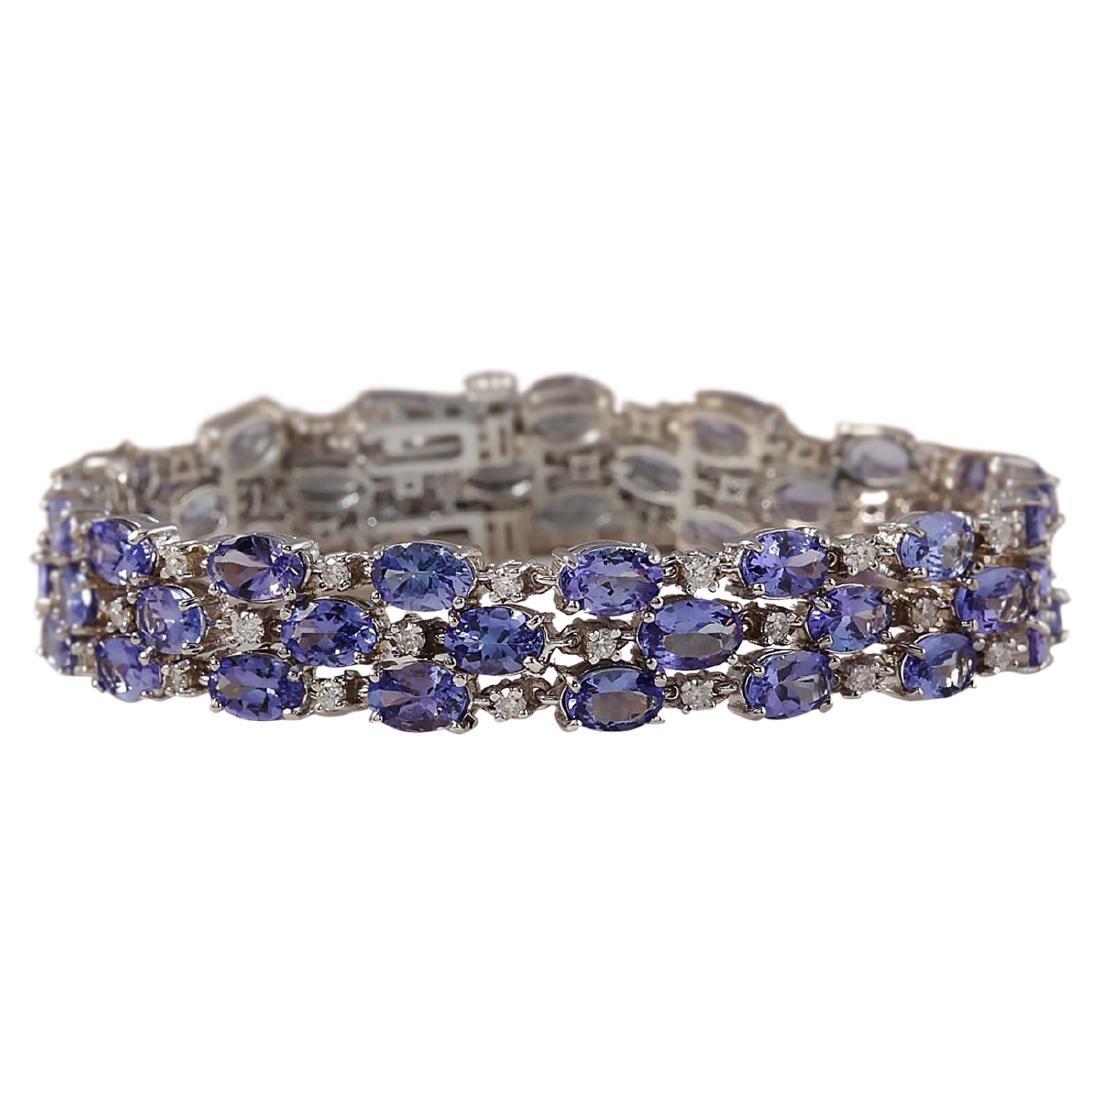 23.85 CTW Natural Tanzanite And Dimond Bracelet In 18K